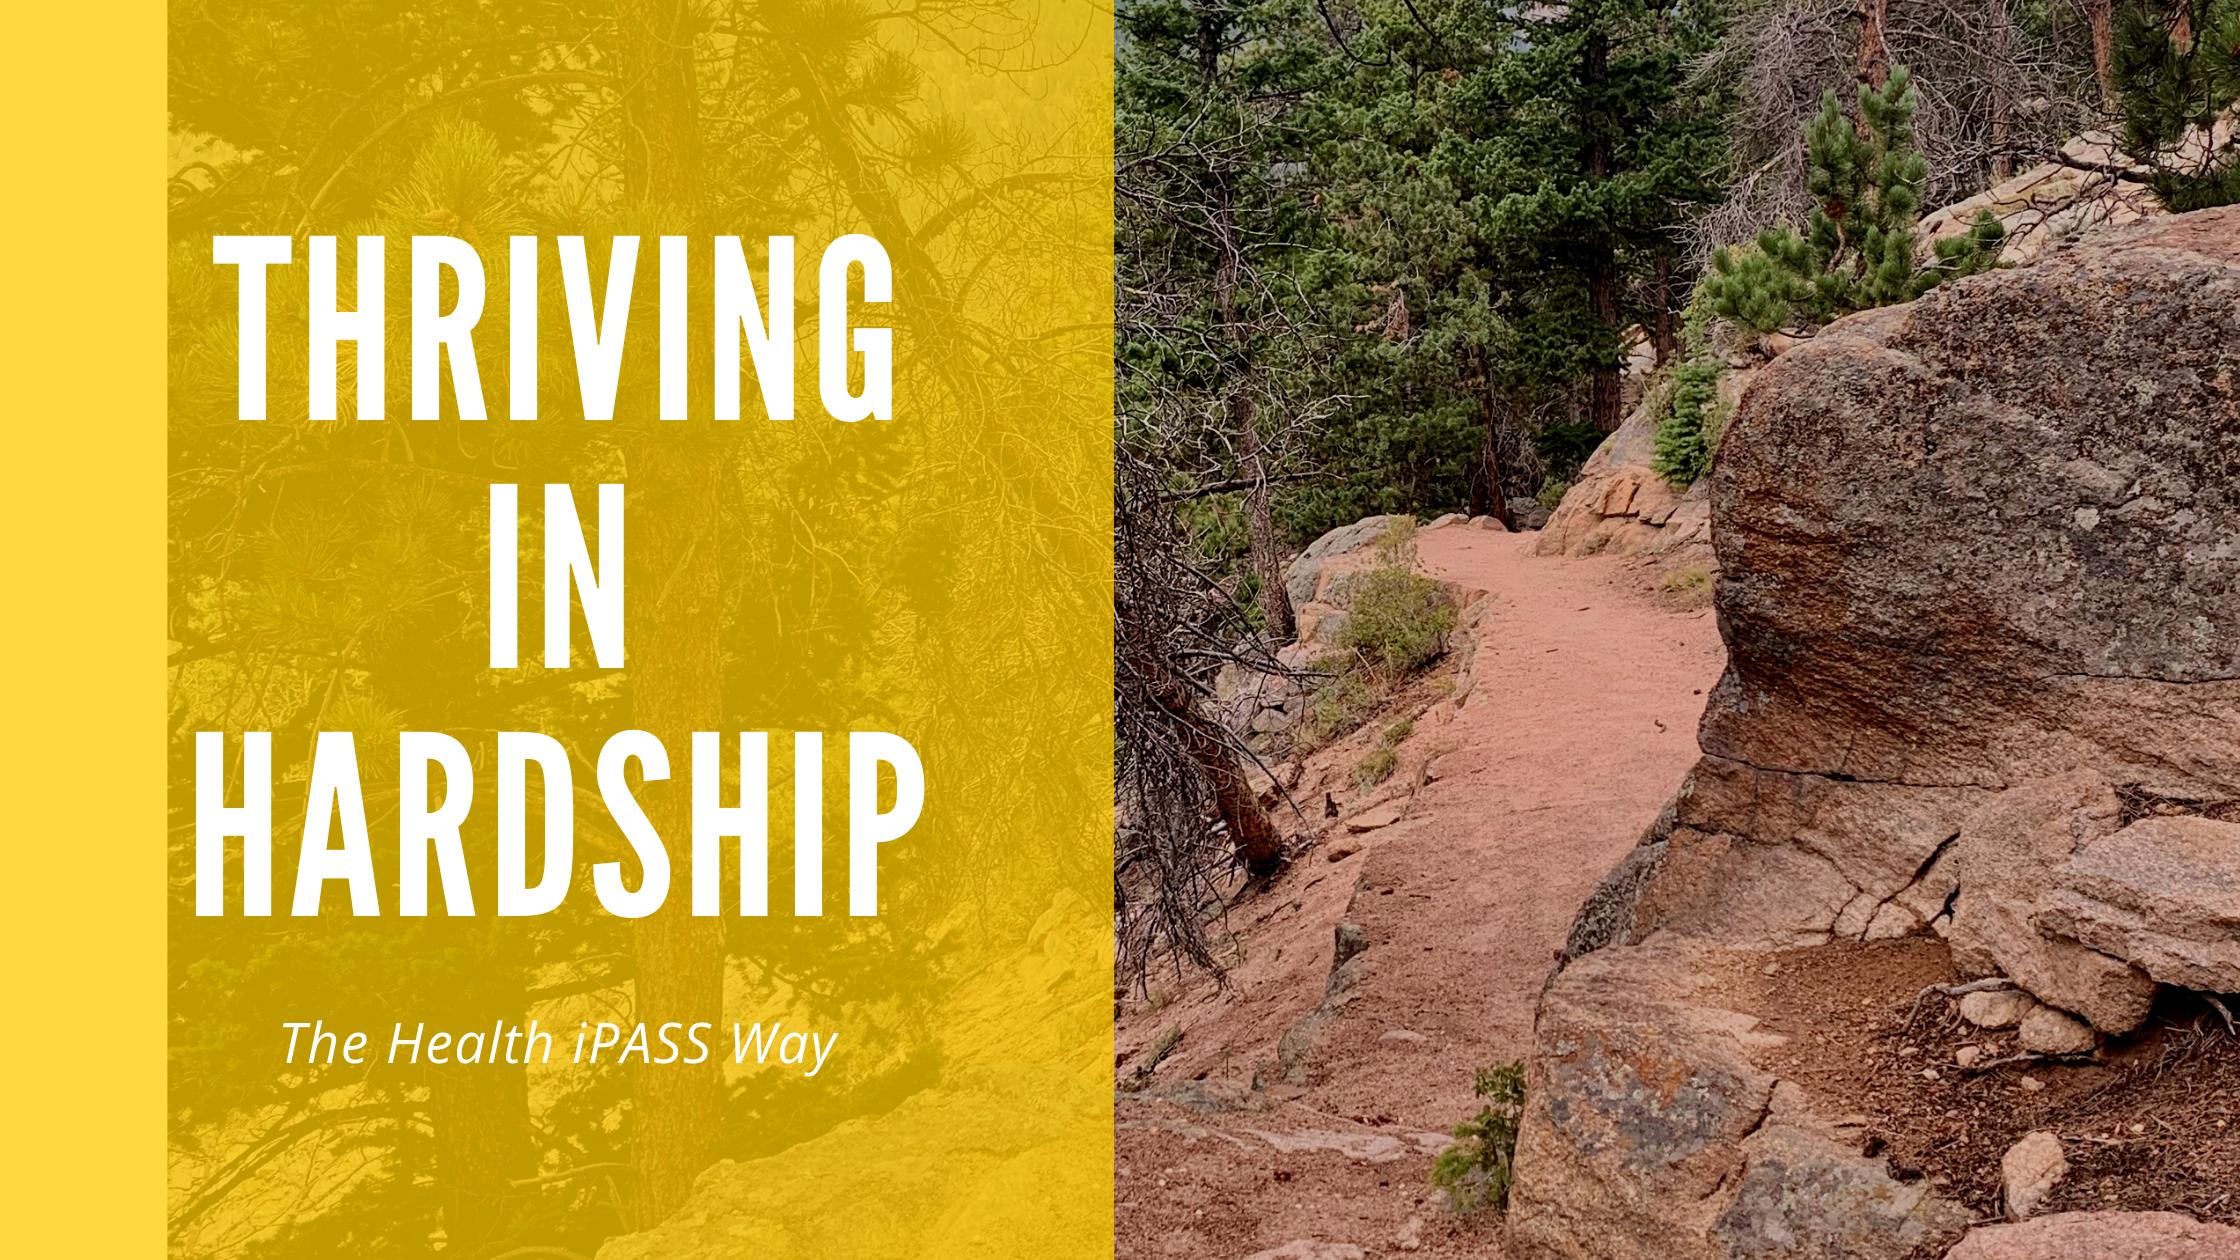 Thriving In hardship